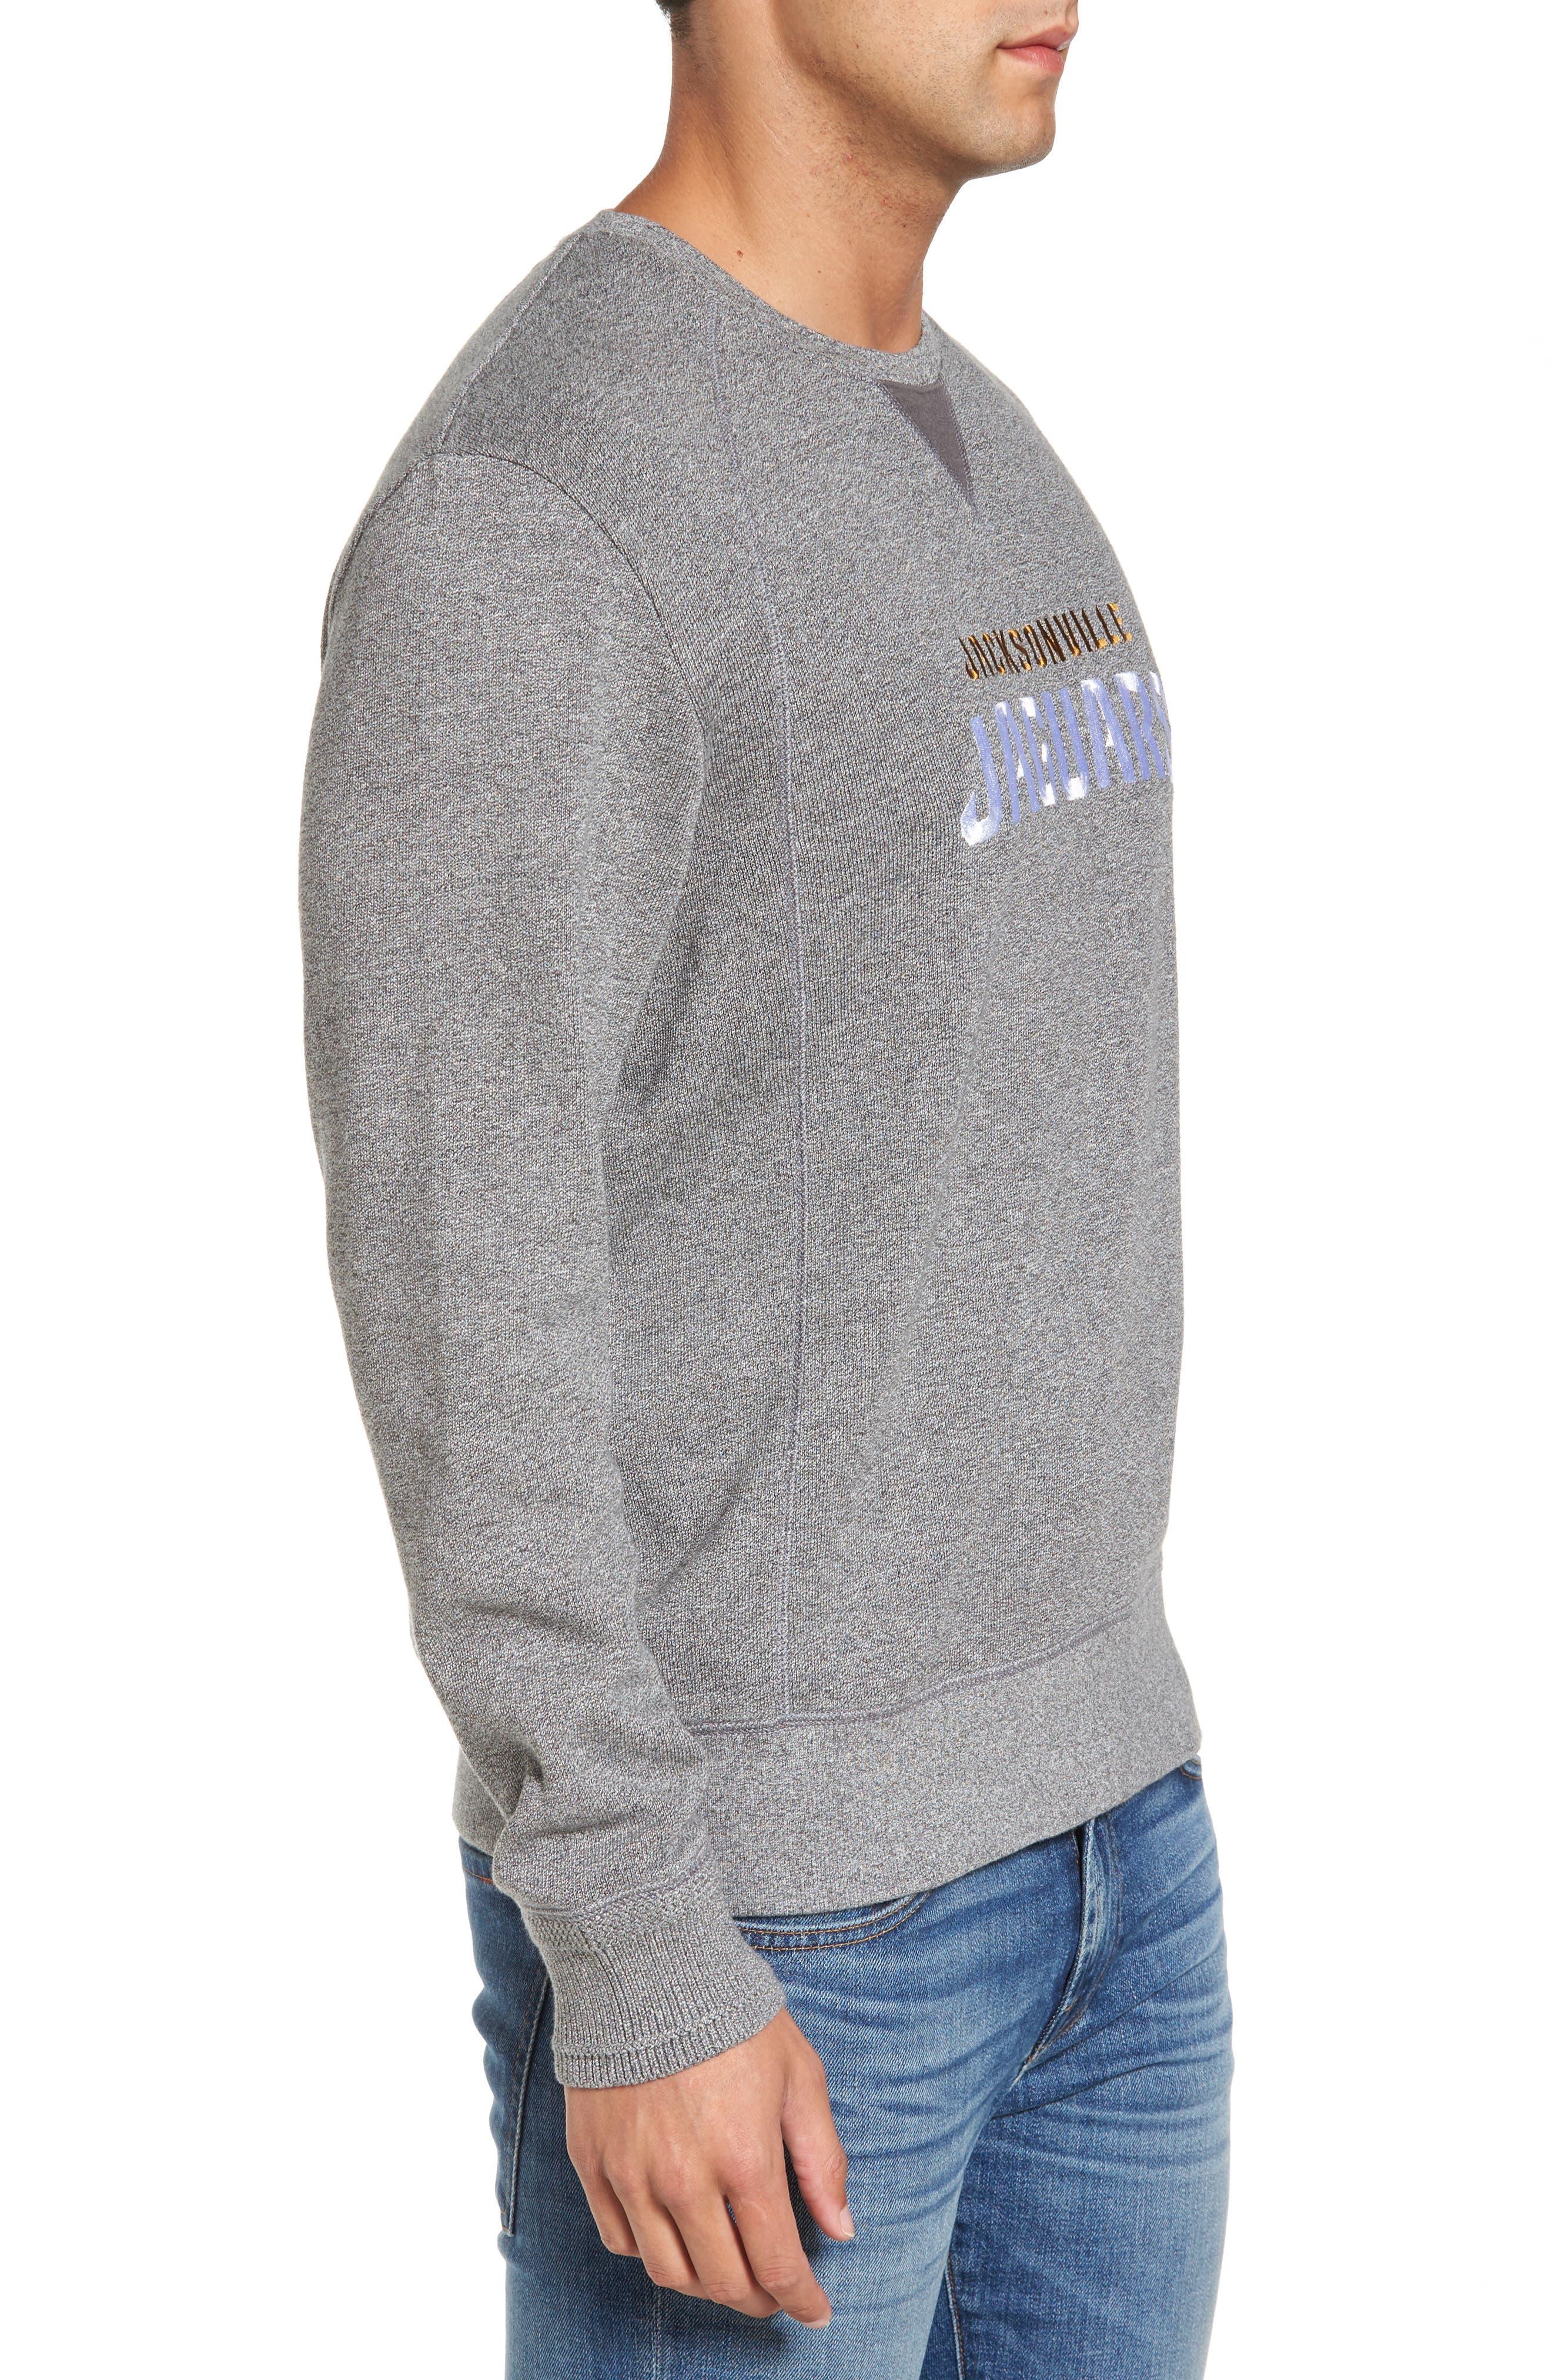 NFL Stitch of Liberty Embroidered Crewneck Sweatshirt,                             Alternate thumbnail 78, color,